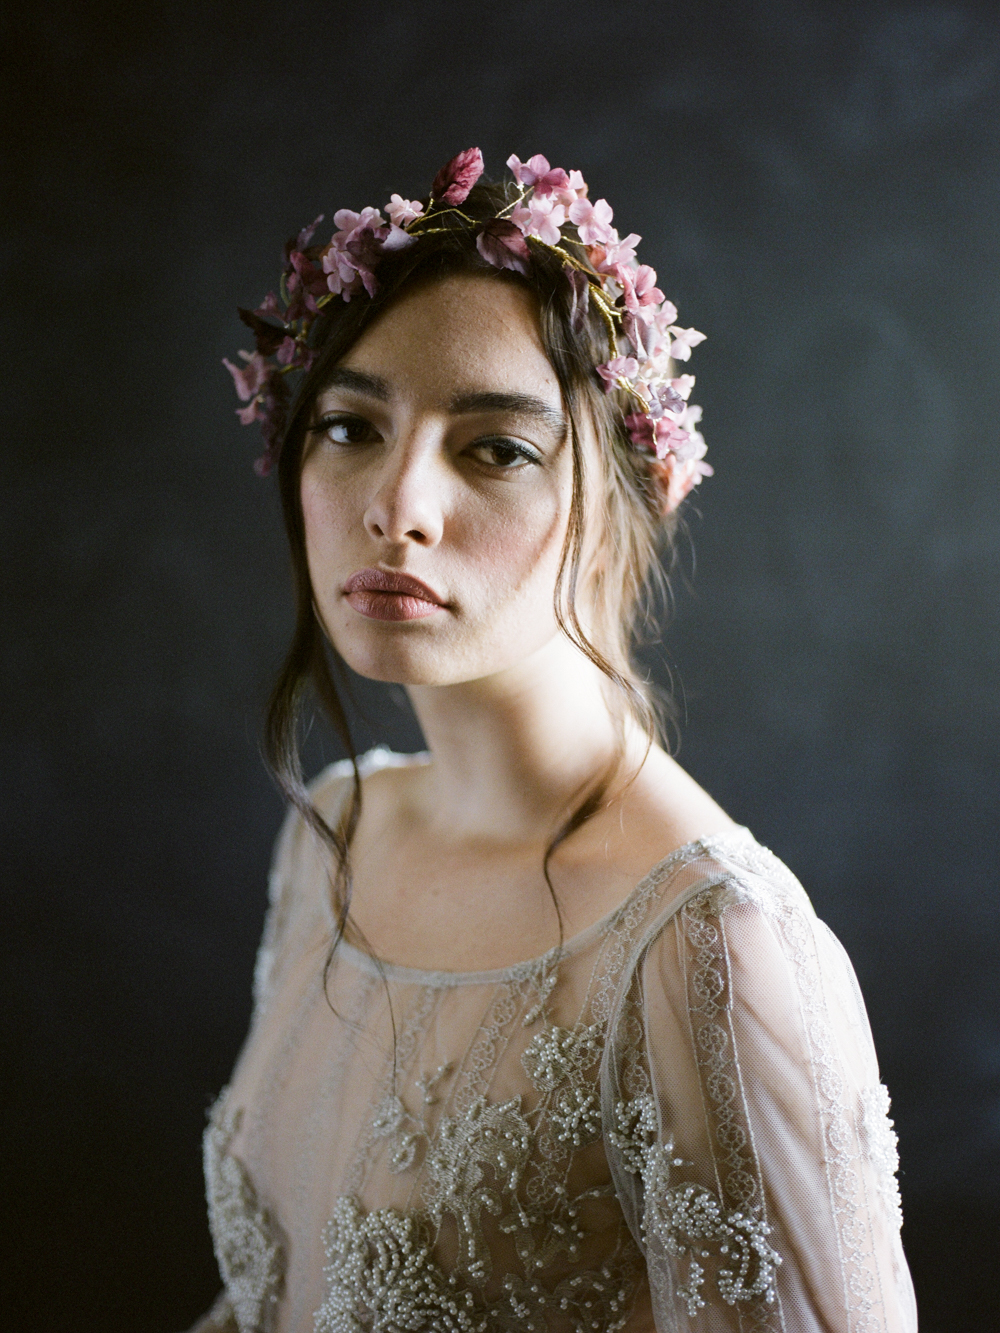 Christine Gosch - Erin Rhyne - film photographer - brand photographer - portrait photographer-2.jpg